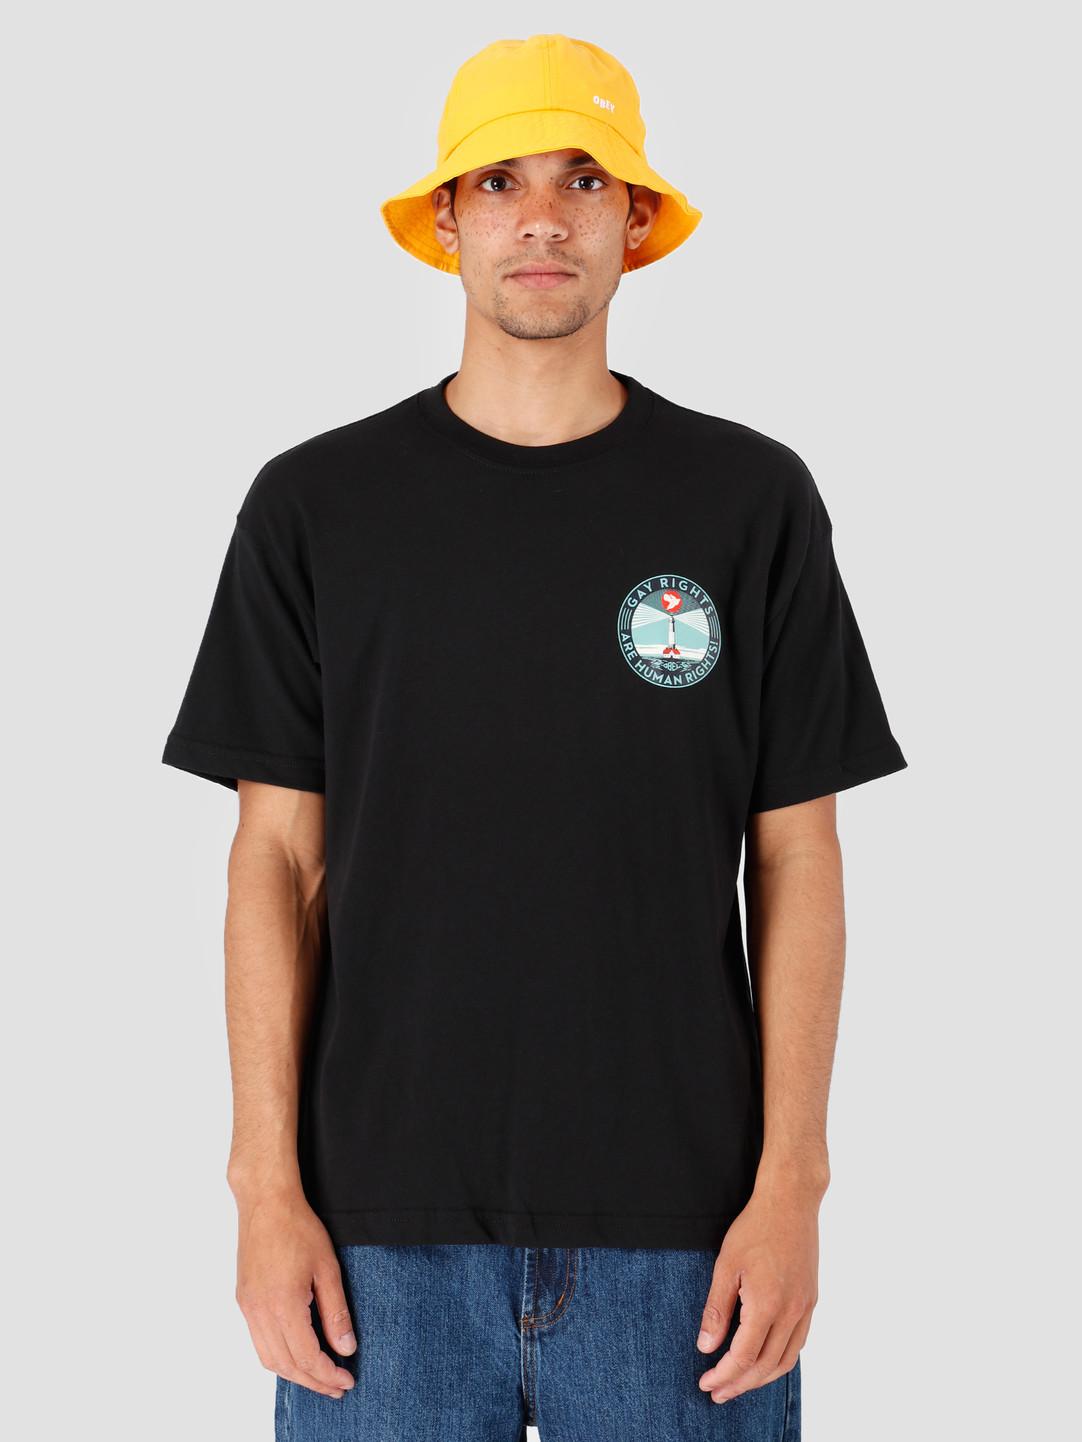 Obey Obey Fire Island T-Shirt Black 167292167-BLK